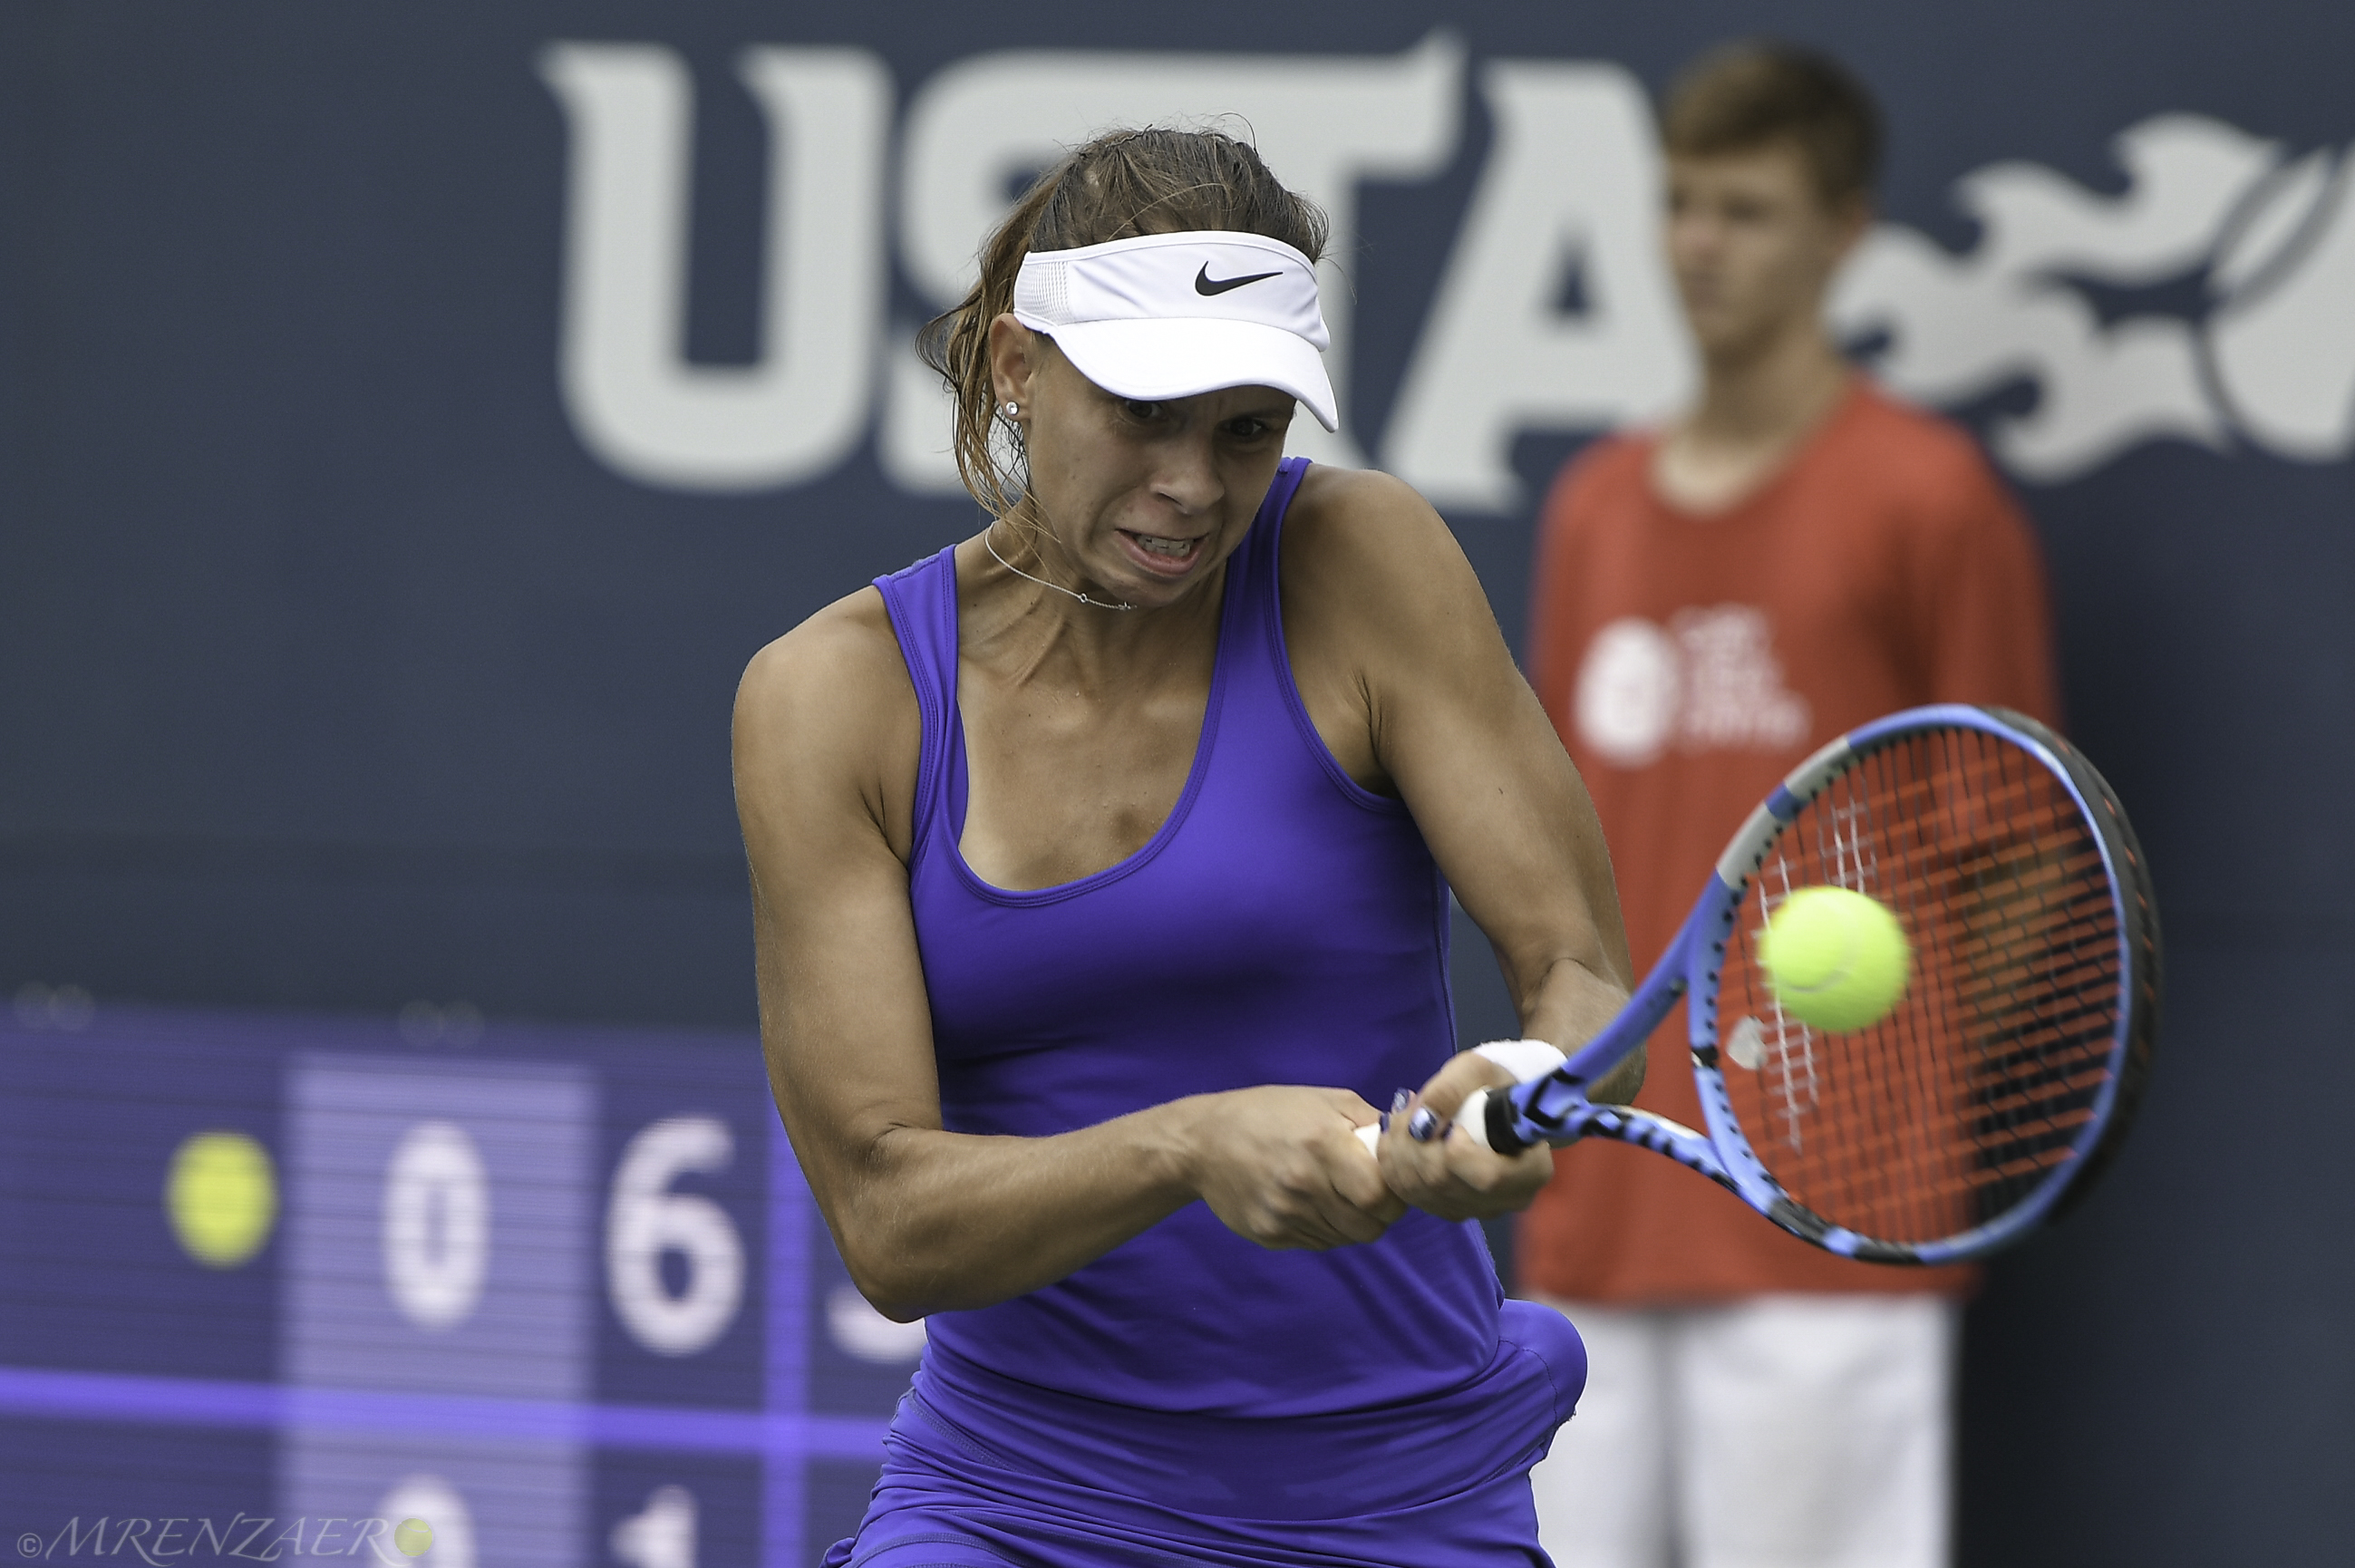 Magda Linette, 2019 Bronx Open (Photo: Mike Renz for TennisAtlantic.com)